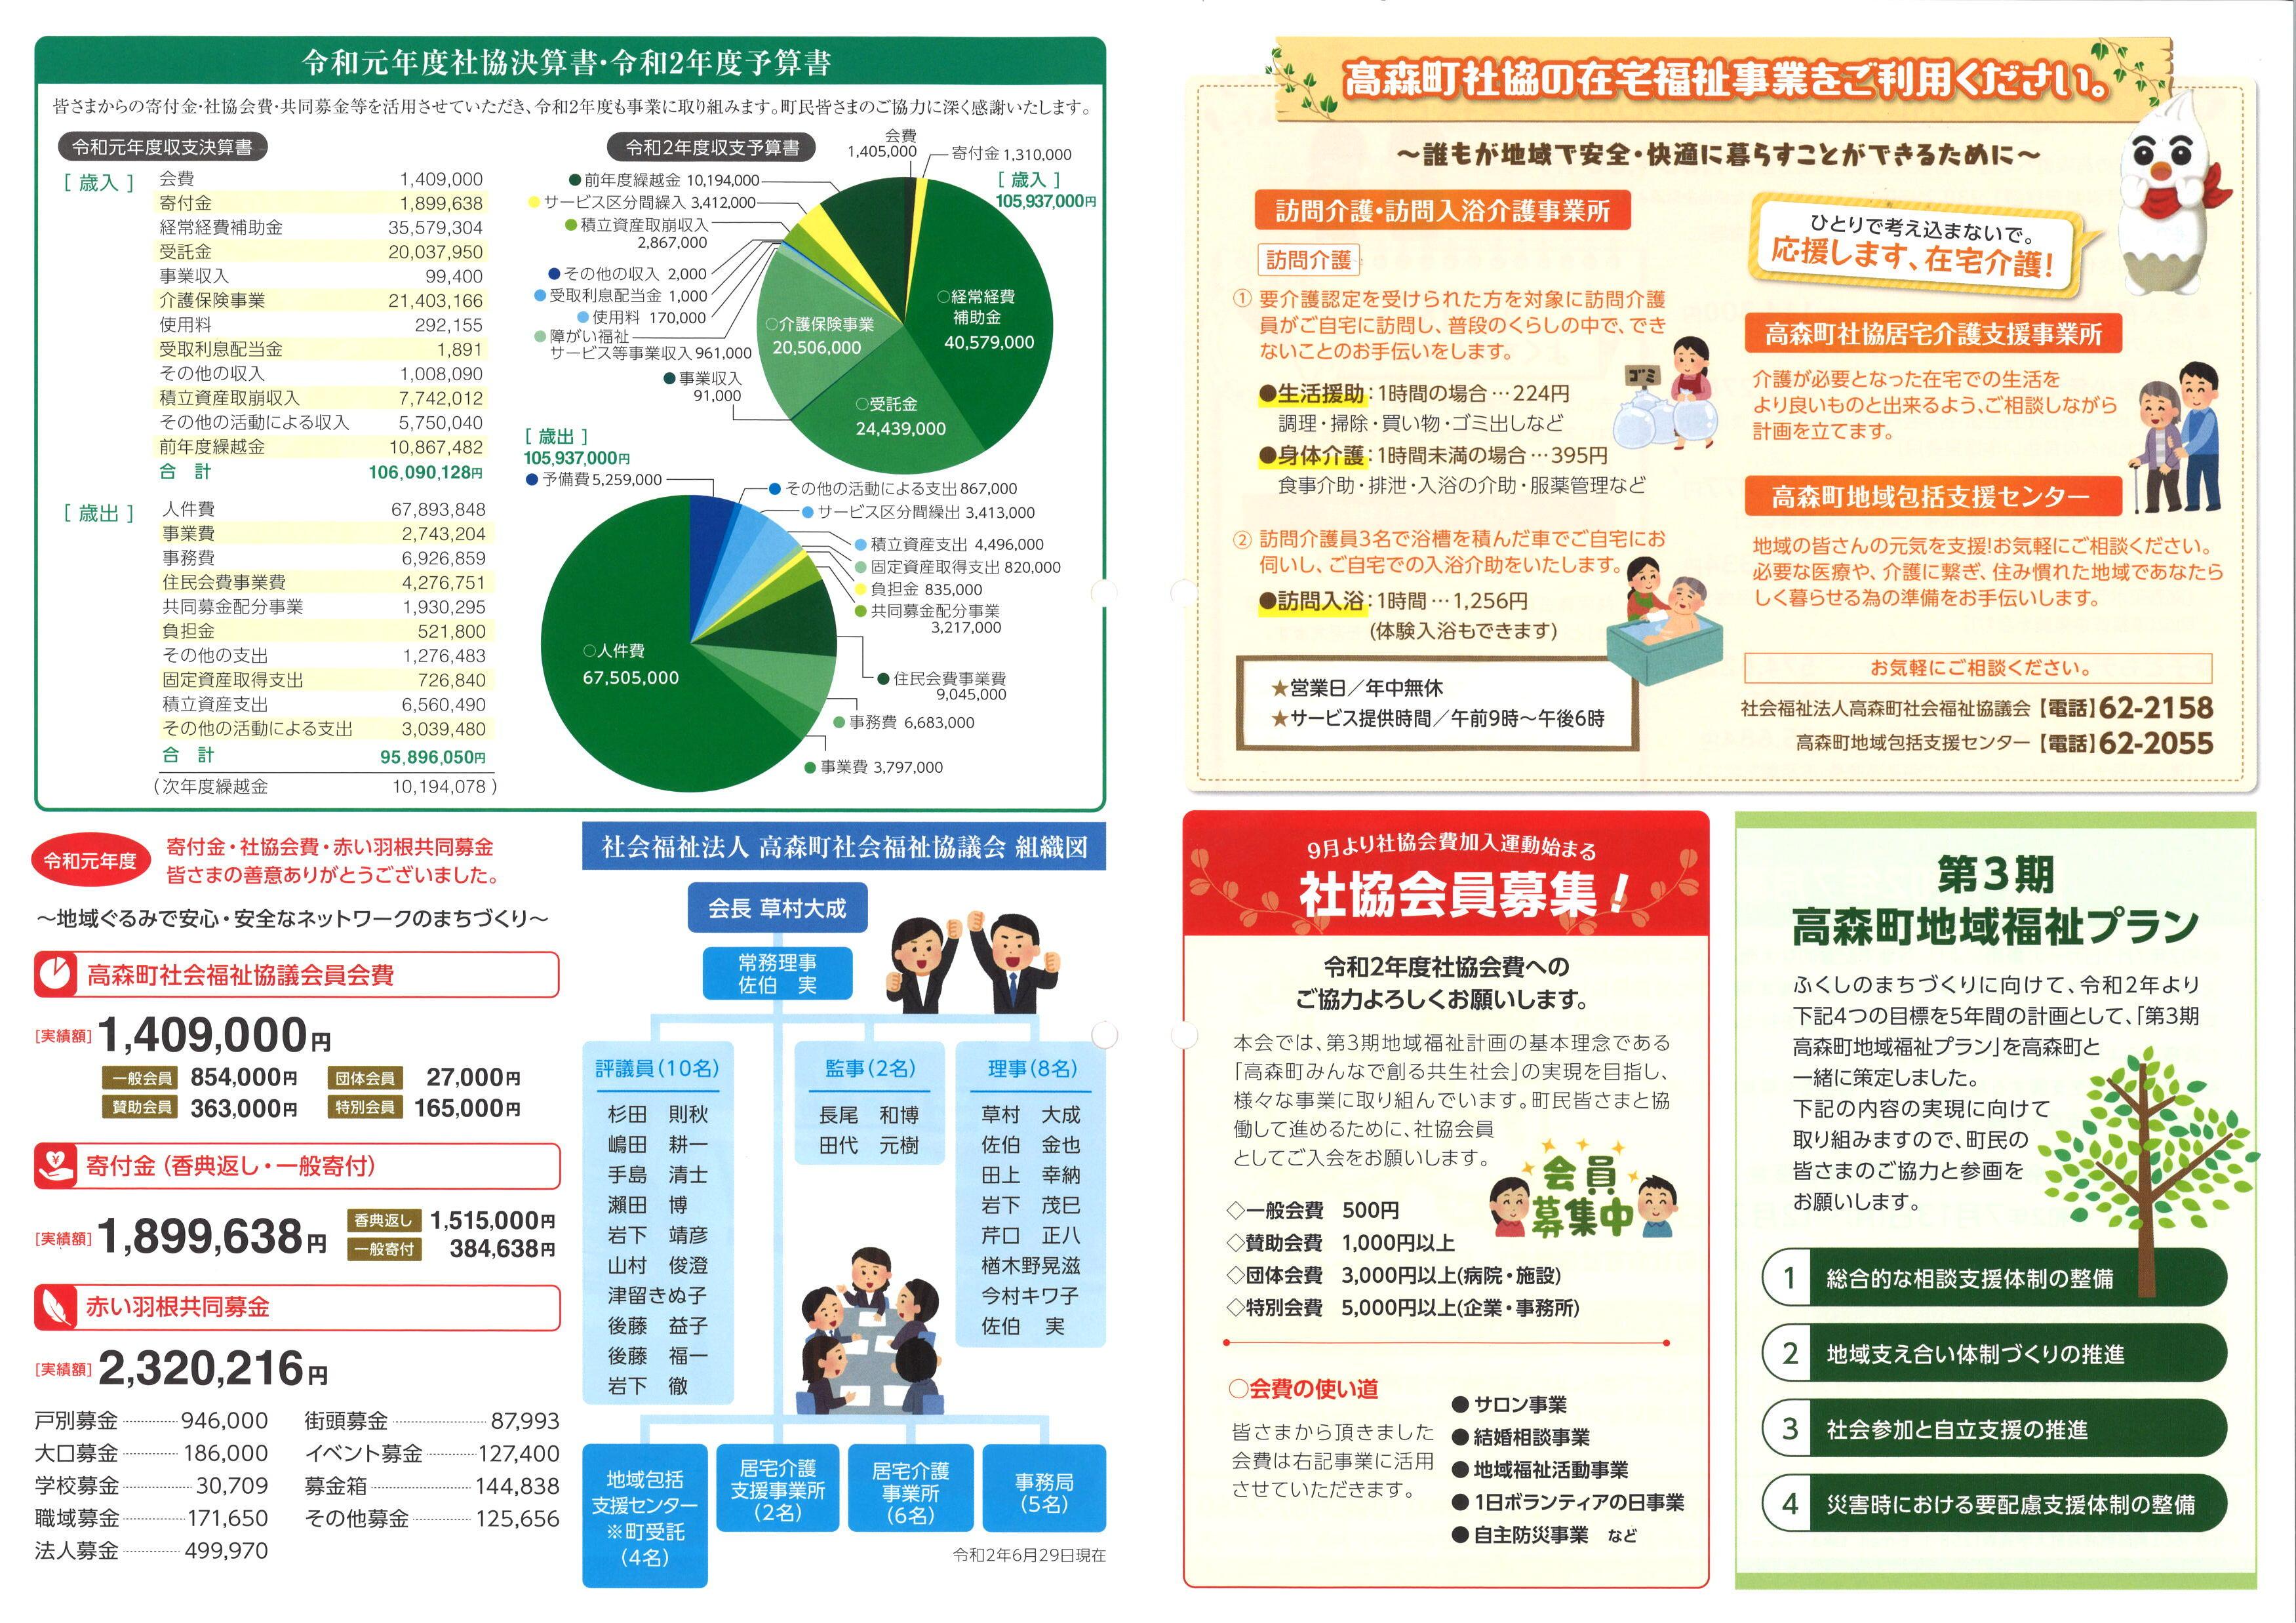 http://www.town.takamori.kumamoto.jp/chosha/somu/upload/ce6d70adbbba7dcc07c387644d06351c50bf8404.jpg